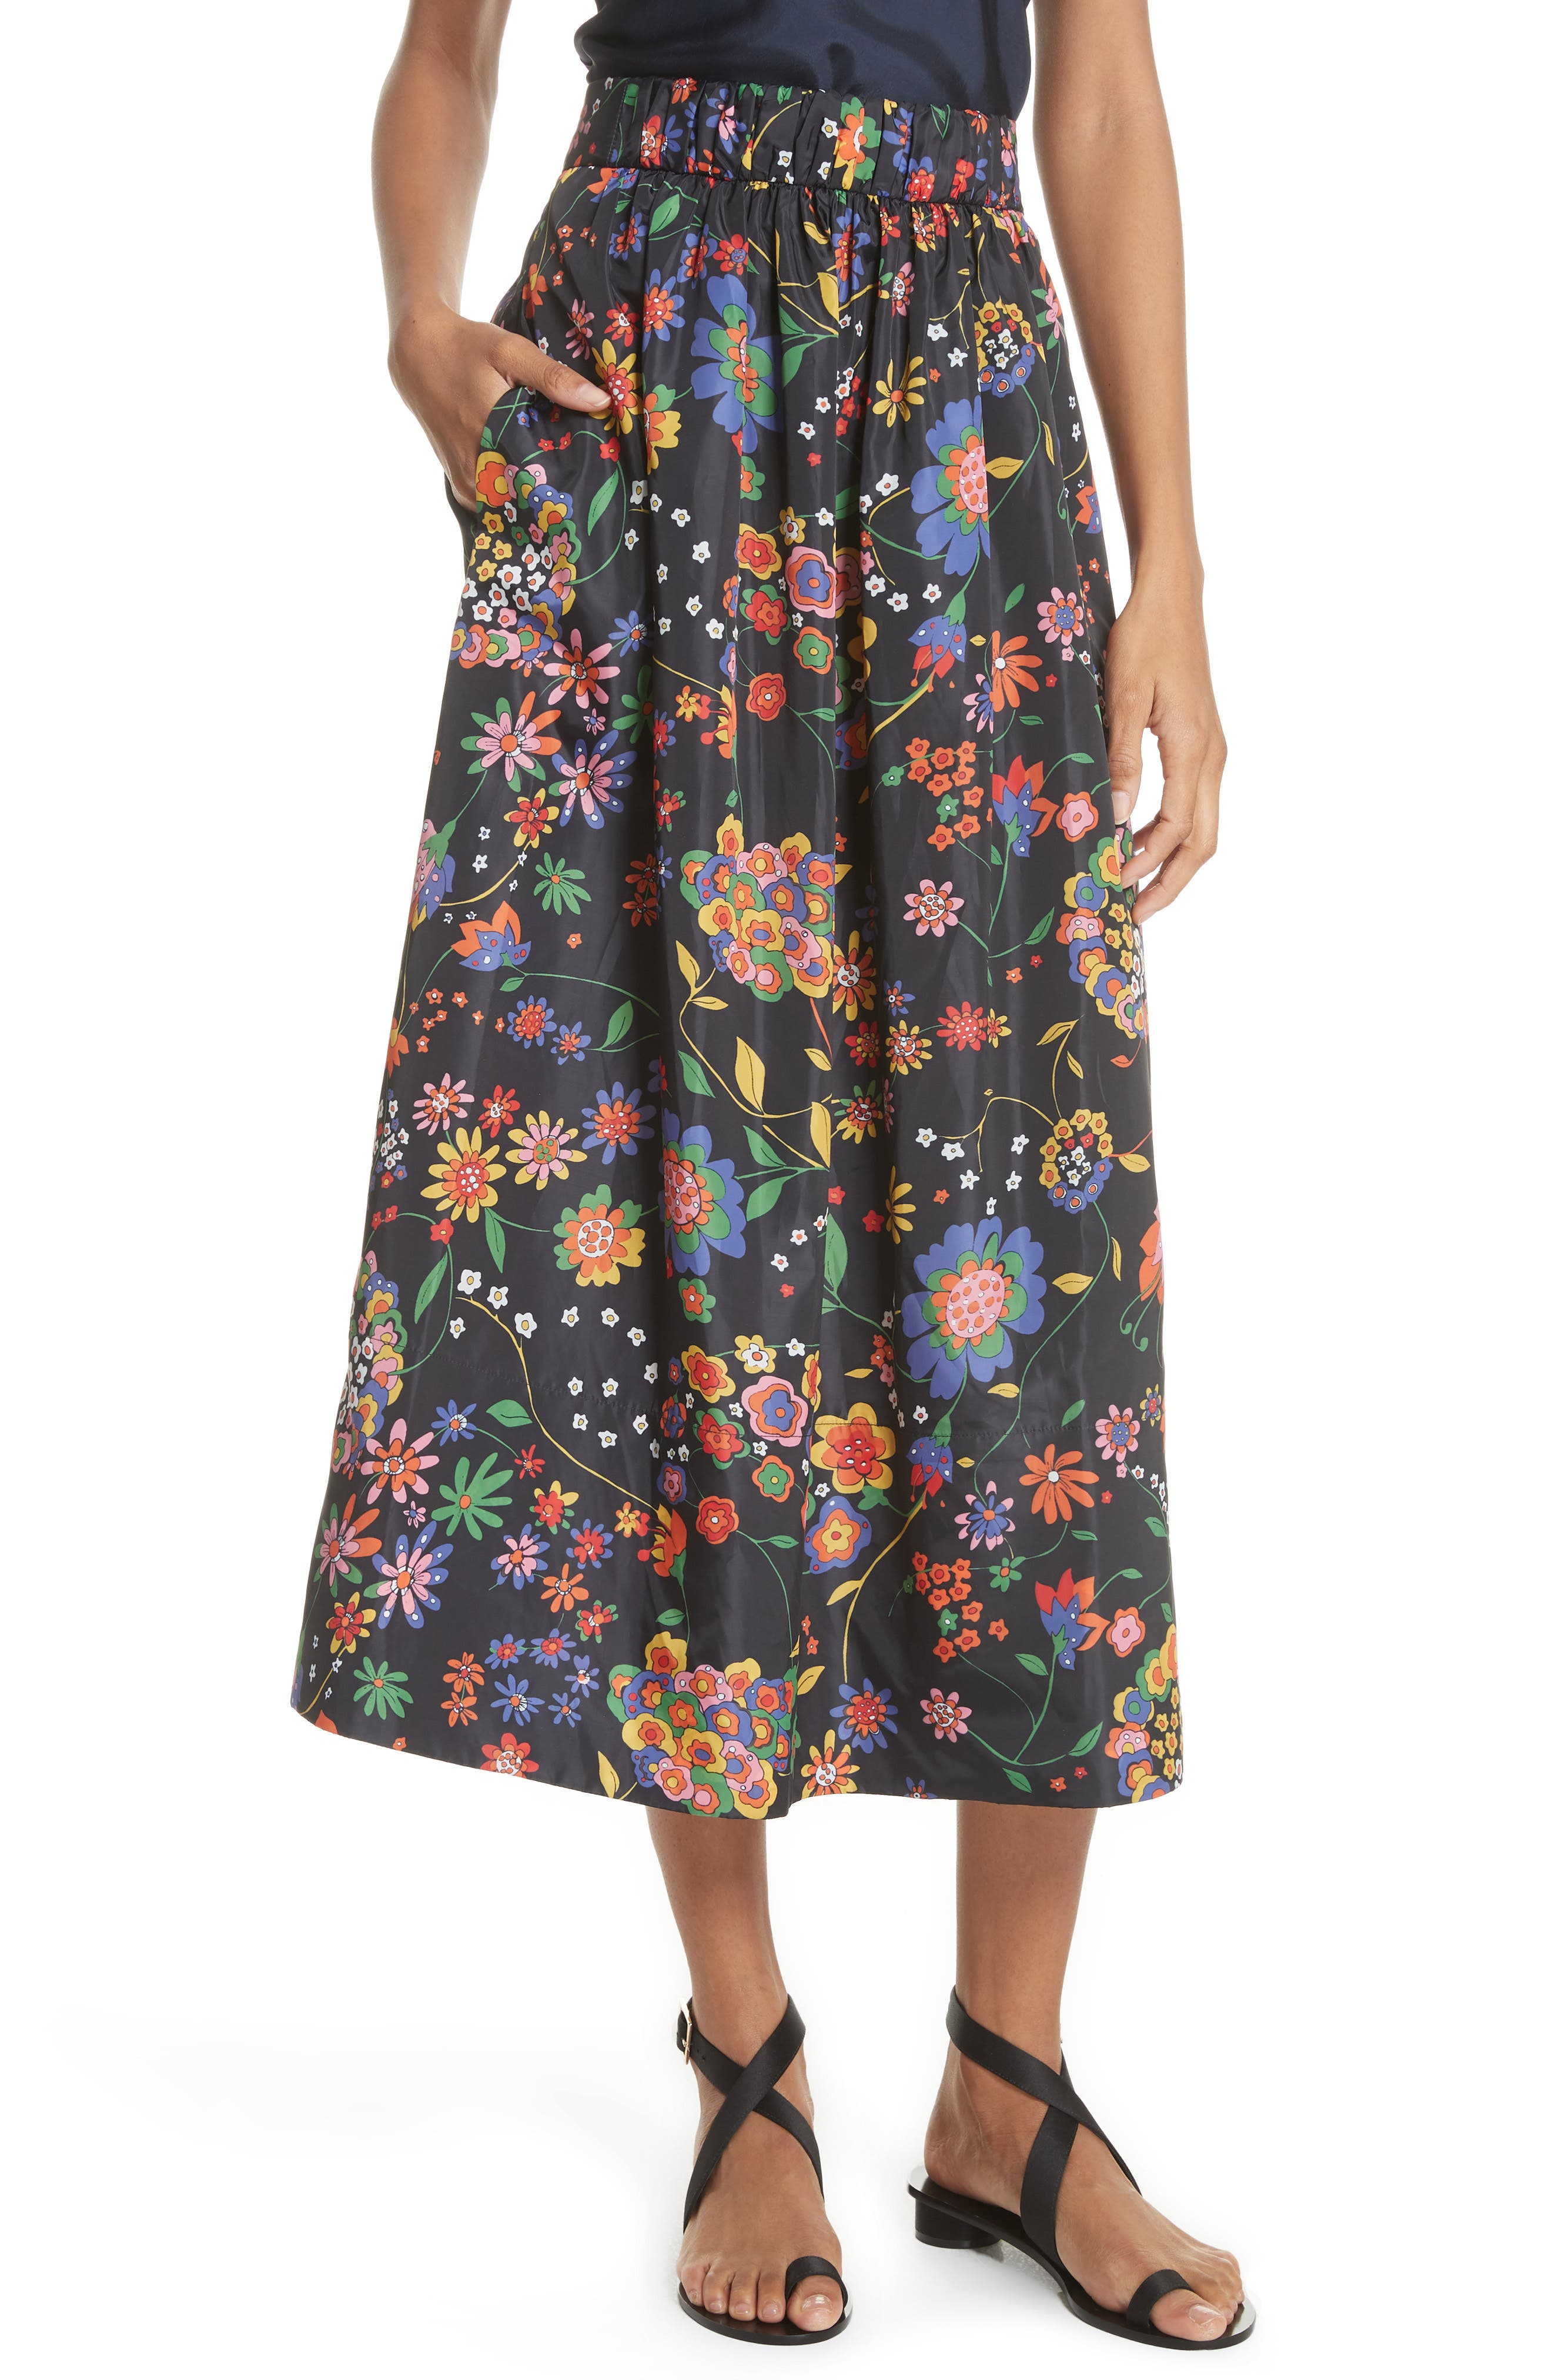 Print Tech Floral Skirt,                             Main thumbnail 1, color,                             402